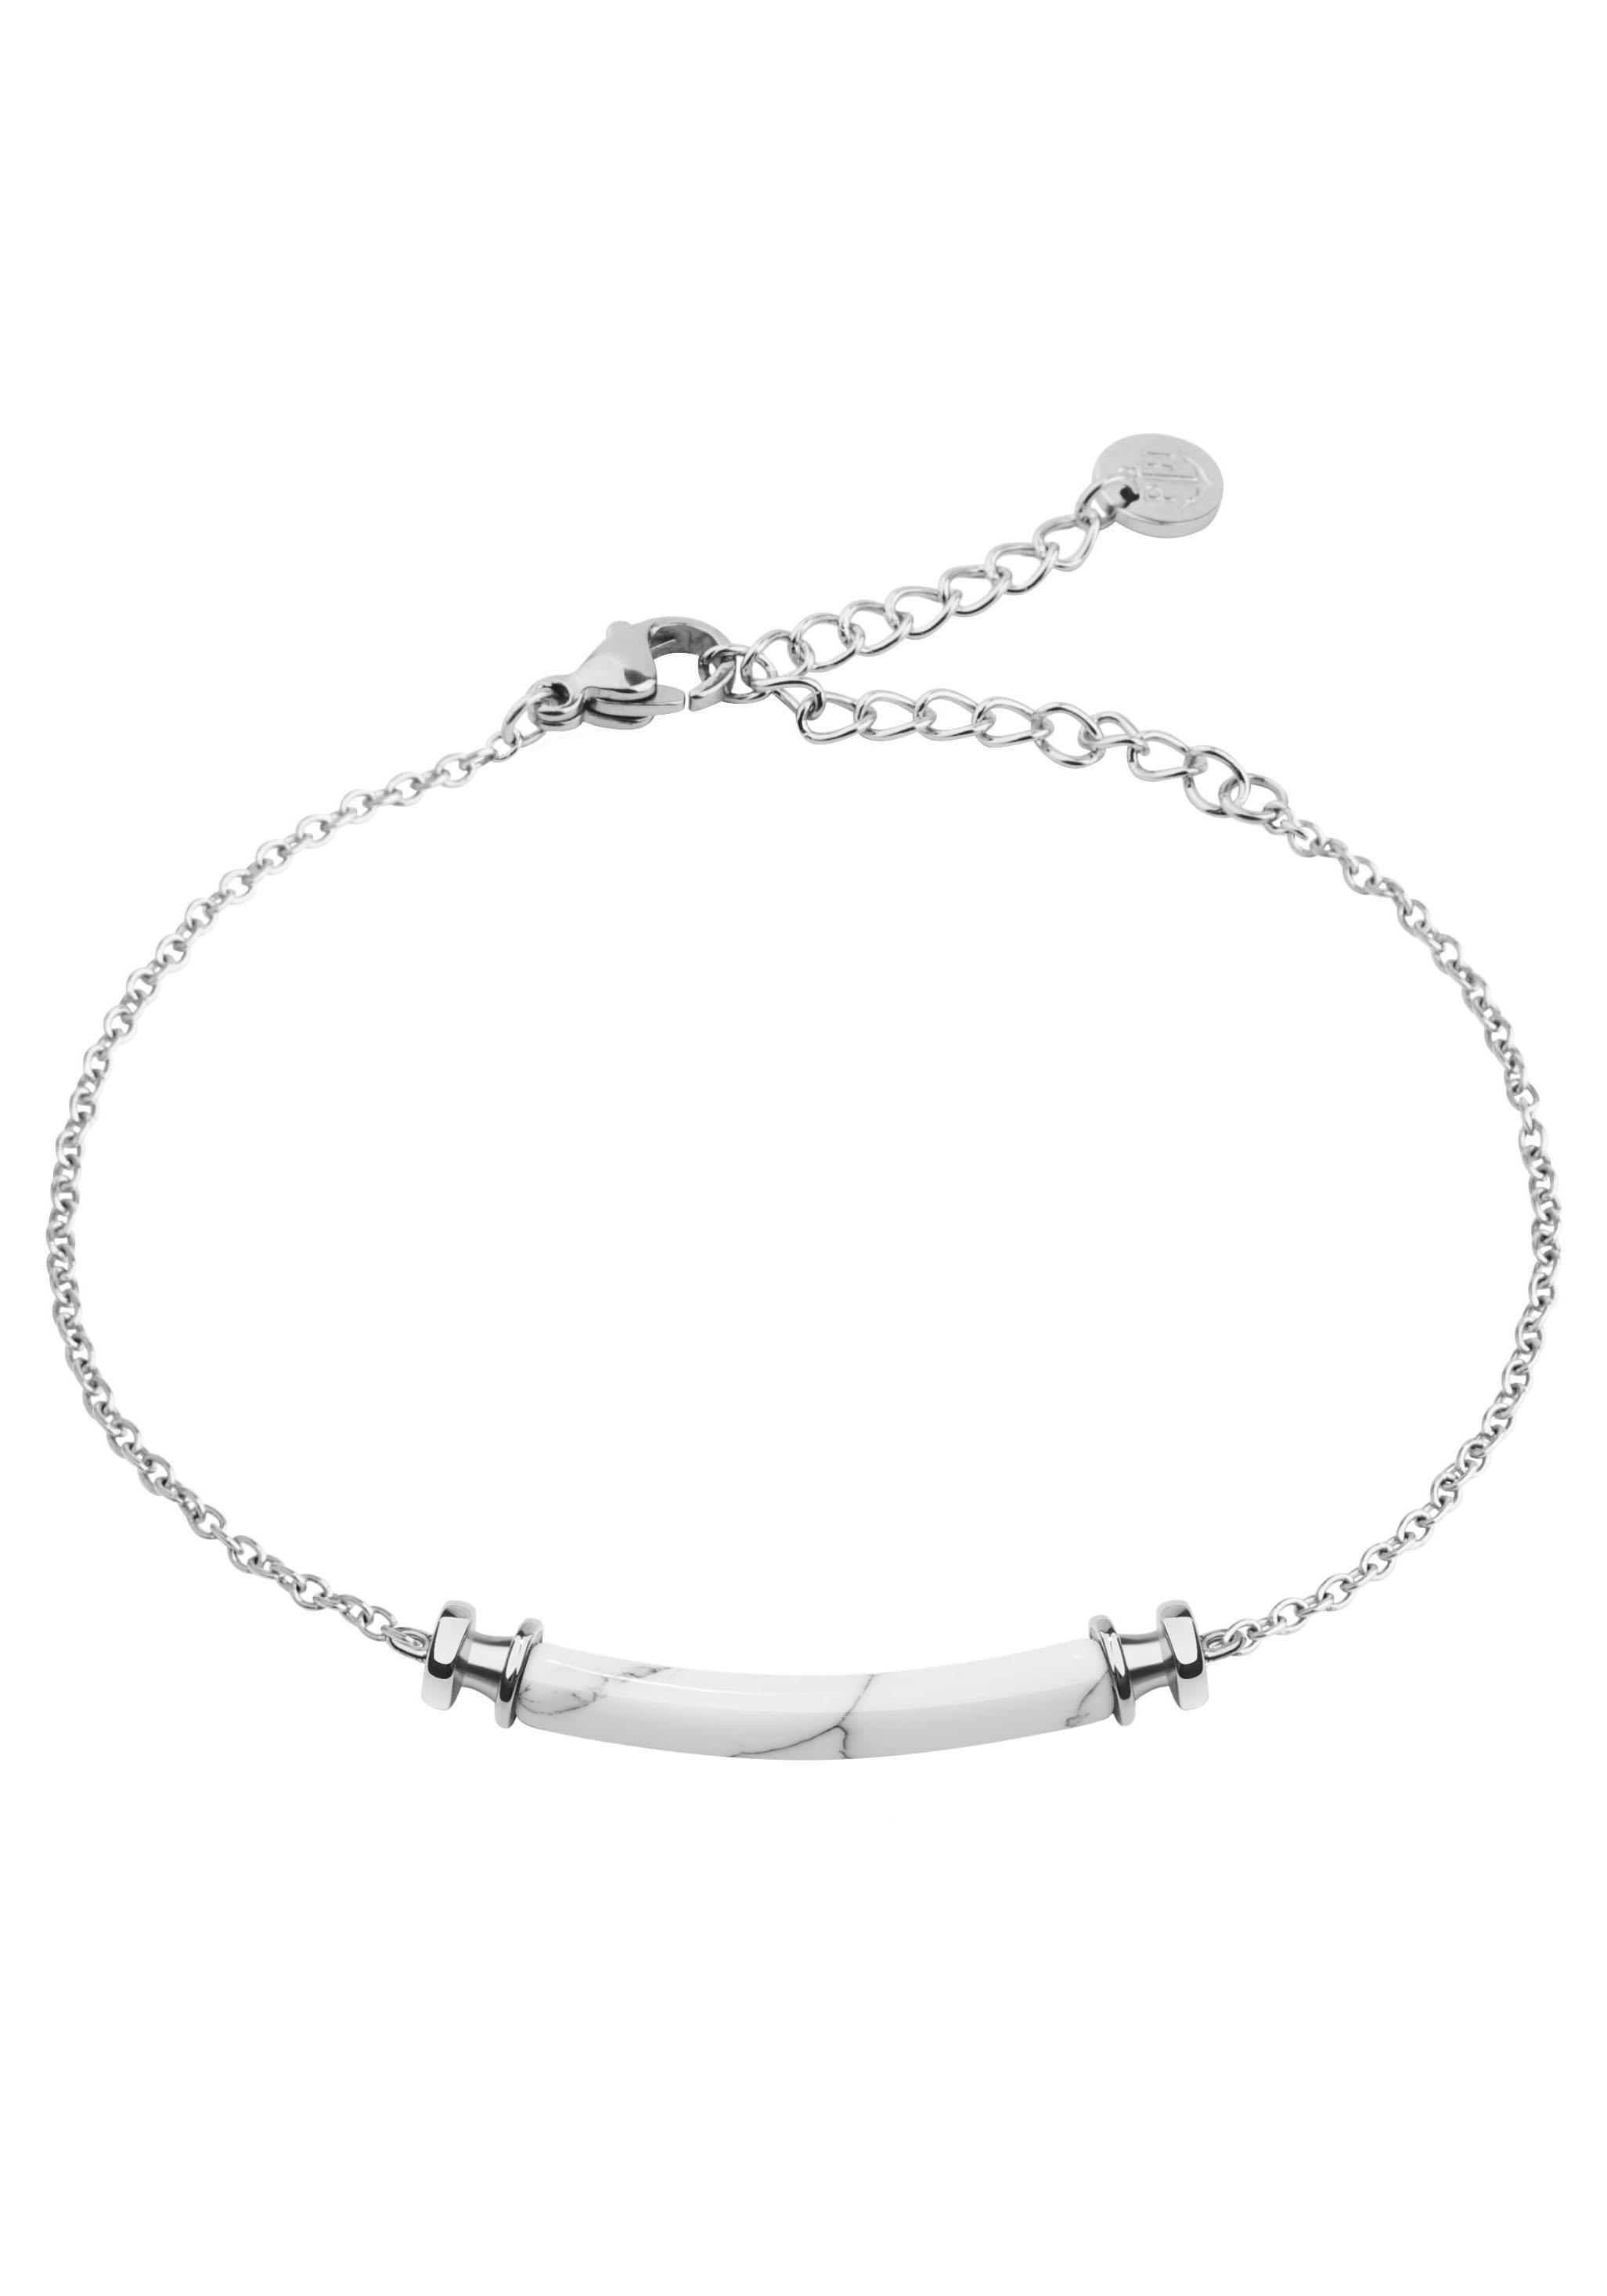 PAUL HEWITT Armband Armkette Starboard Edelstahl Marble, PH-B-WM-S | Schmuck > Armbänder > Armketten | Paul Hewitt